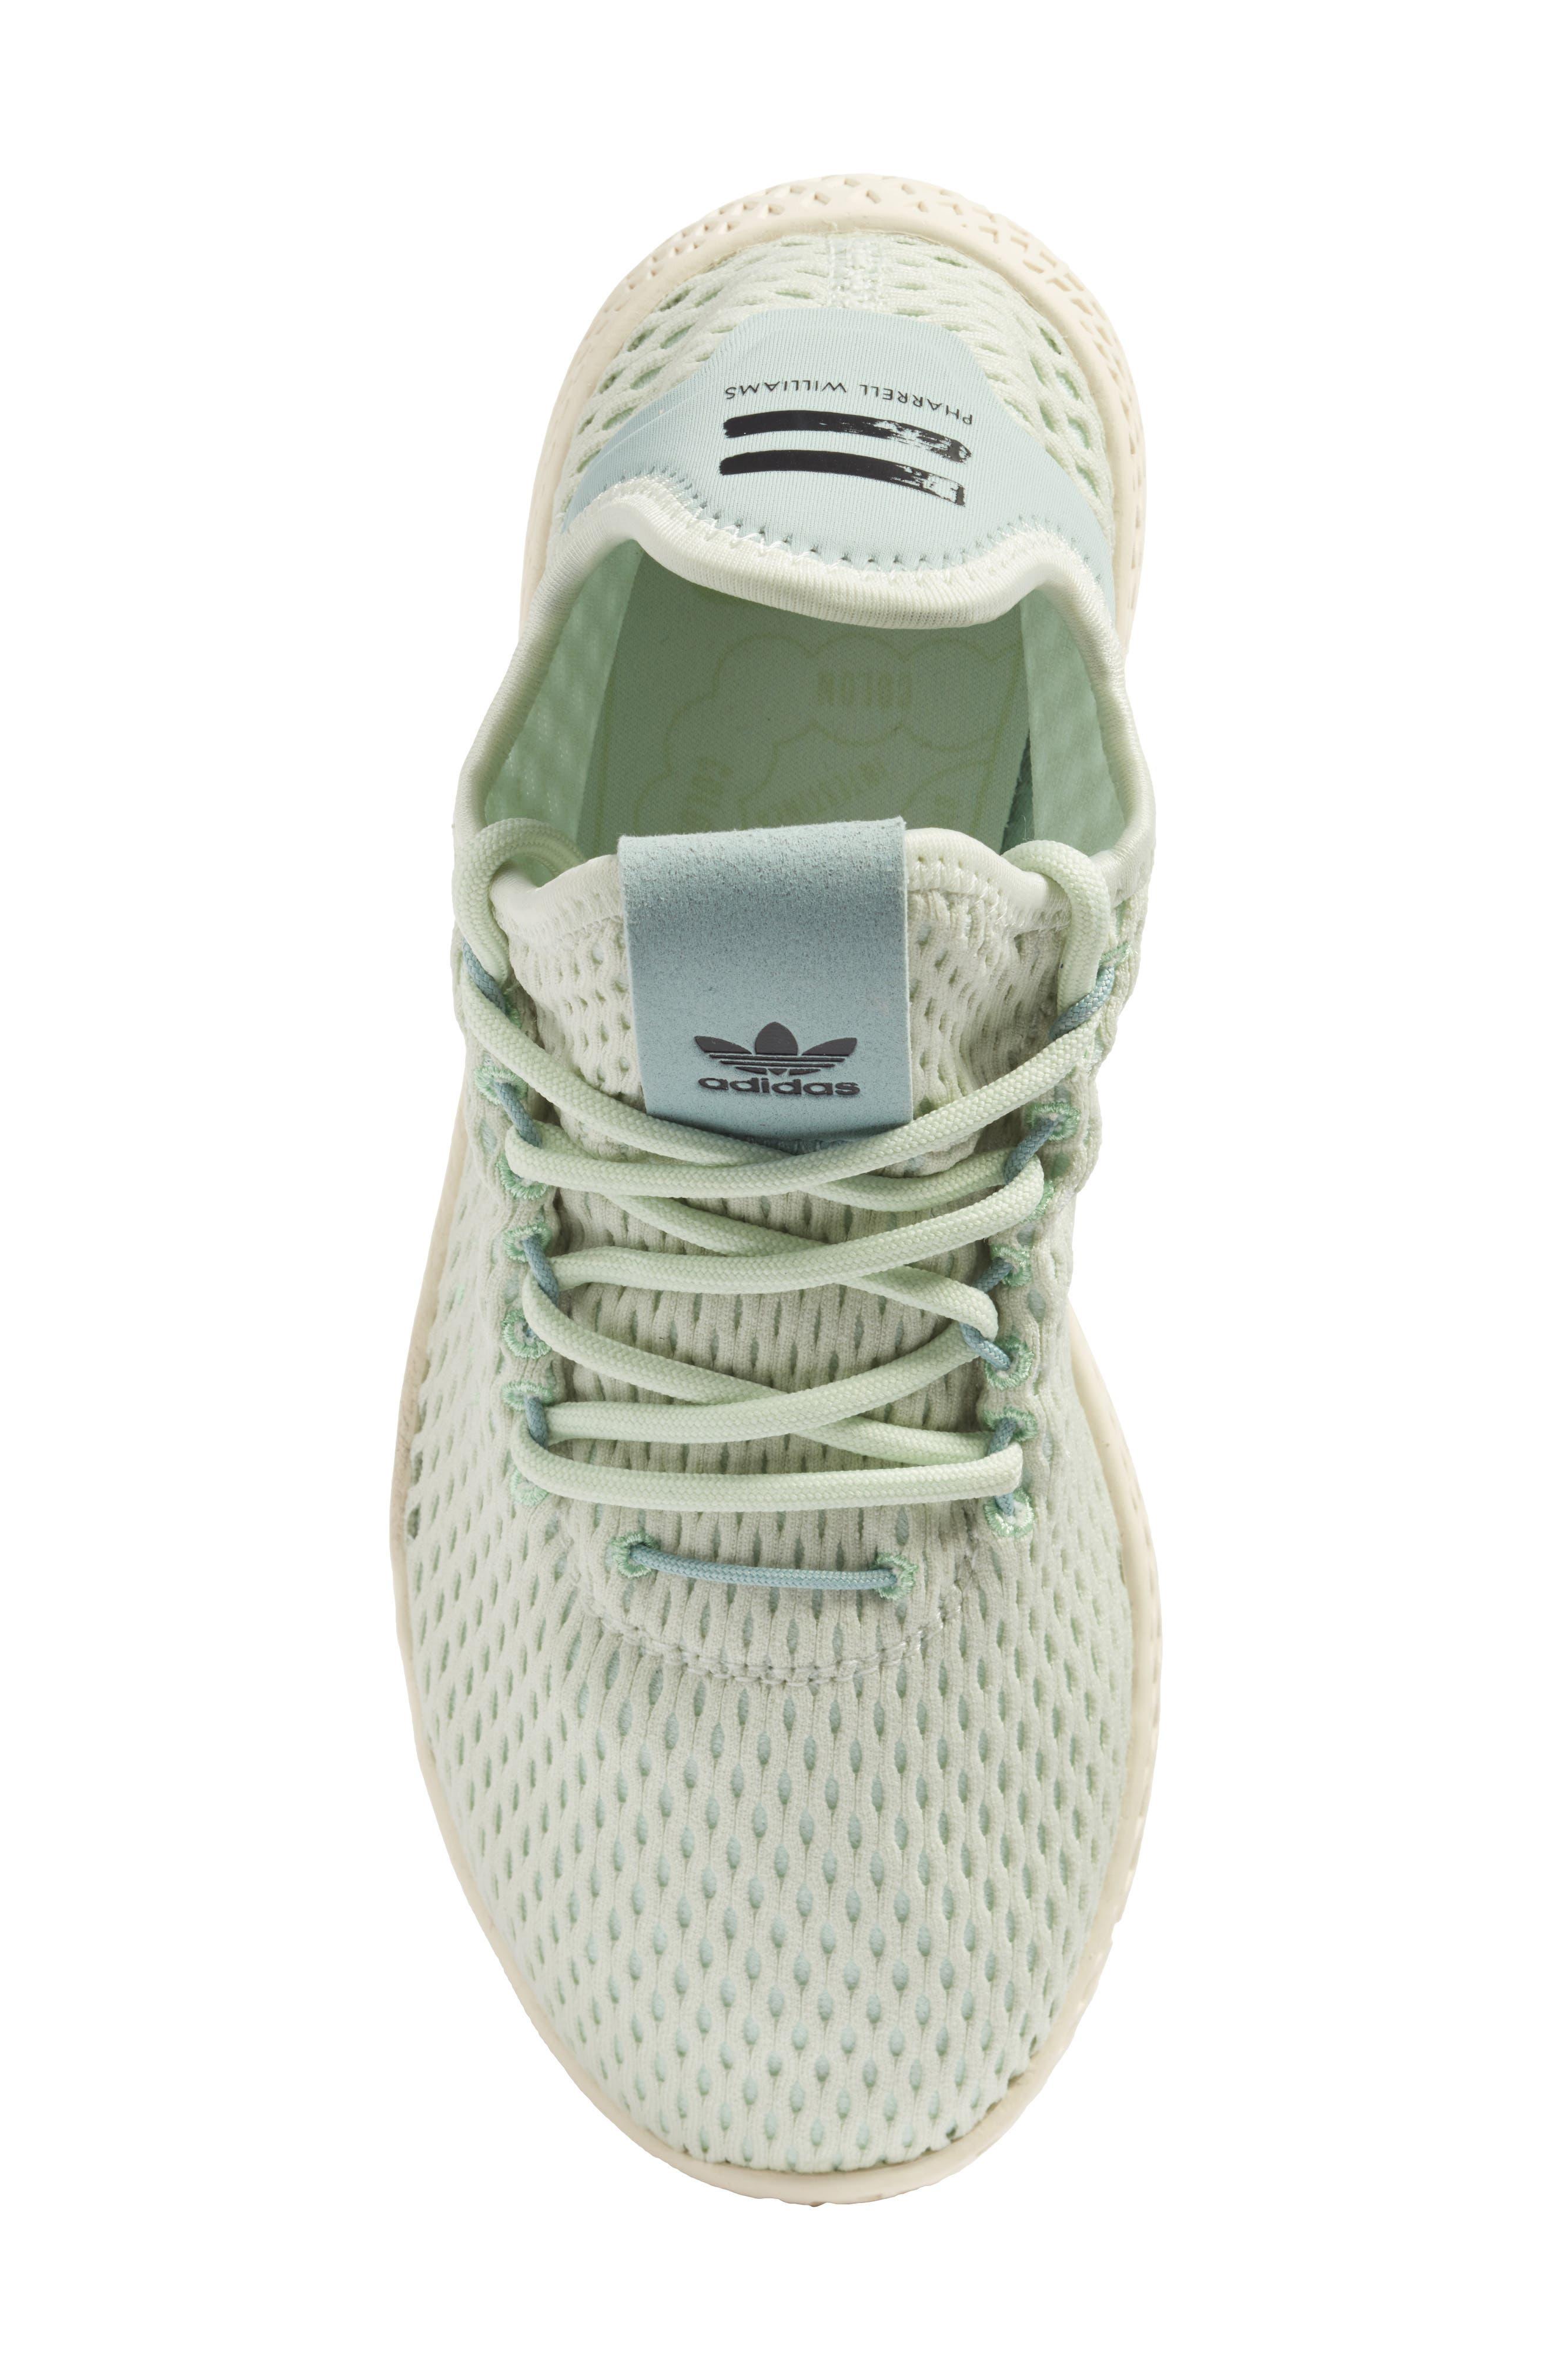 Originals x Pharrell Williams The Summers Mesh Sneaker,                             Alternate thumbnail 5, color,                             334